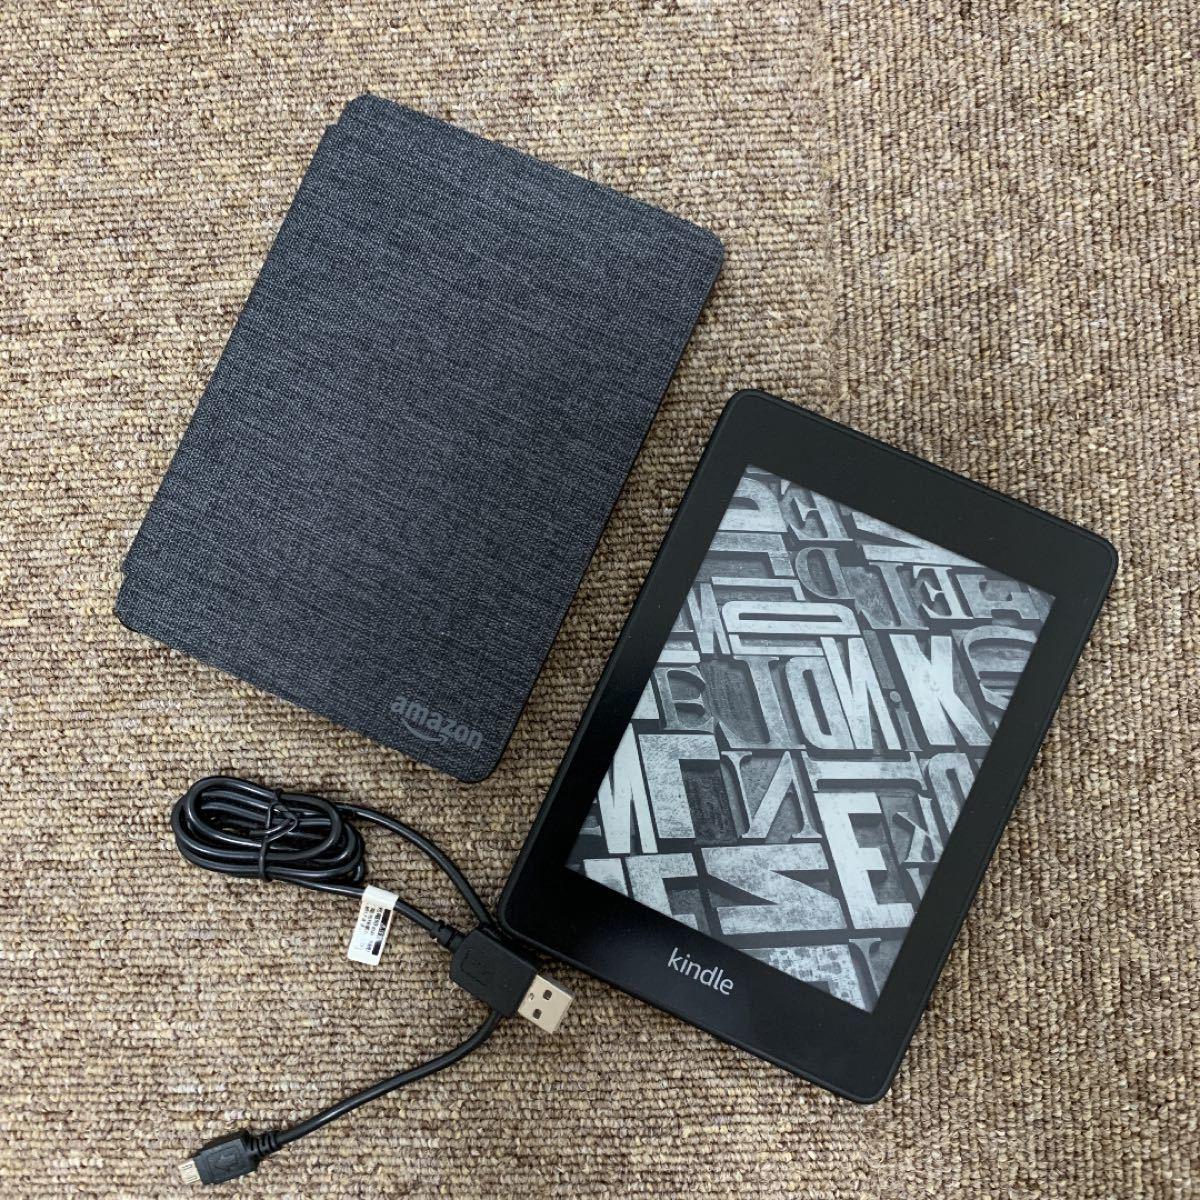 Kindle Paperwhite Wi-Fi  キンドルペーパーホワイト Amazon 電子書籍リーダー アマゾン 広告なし